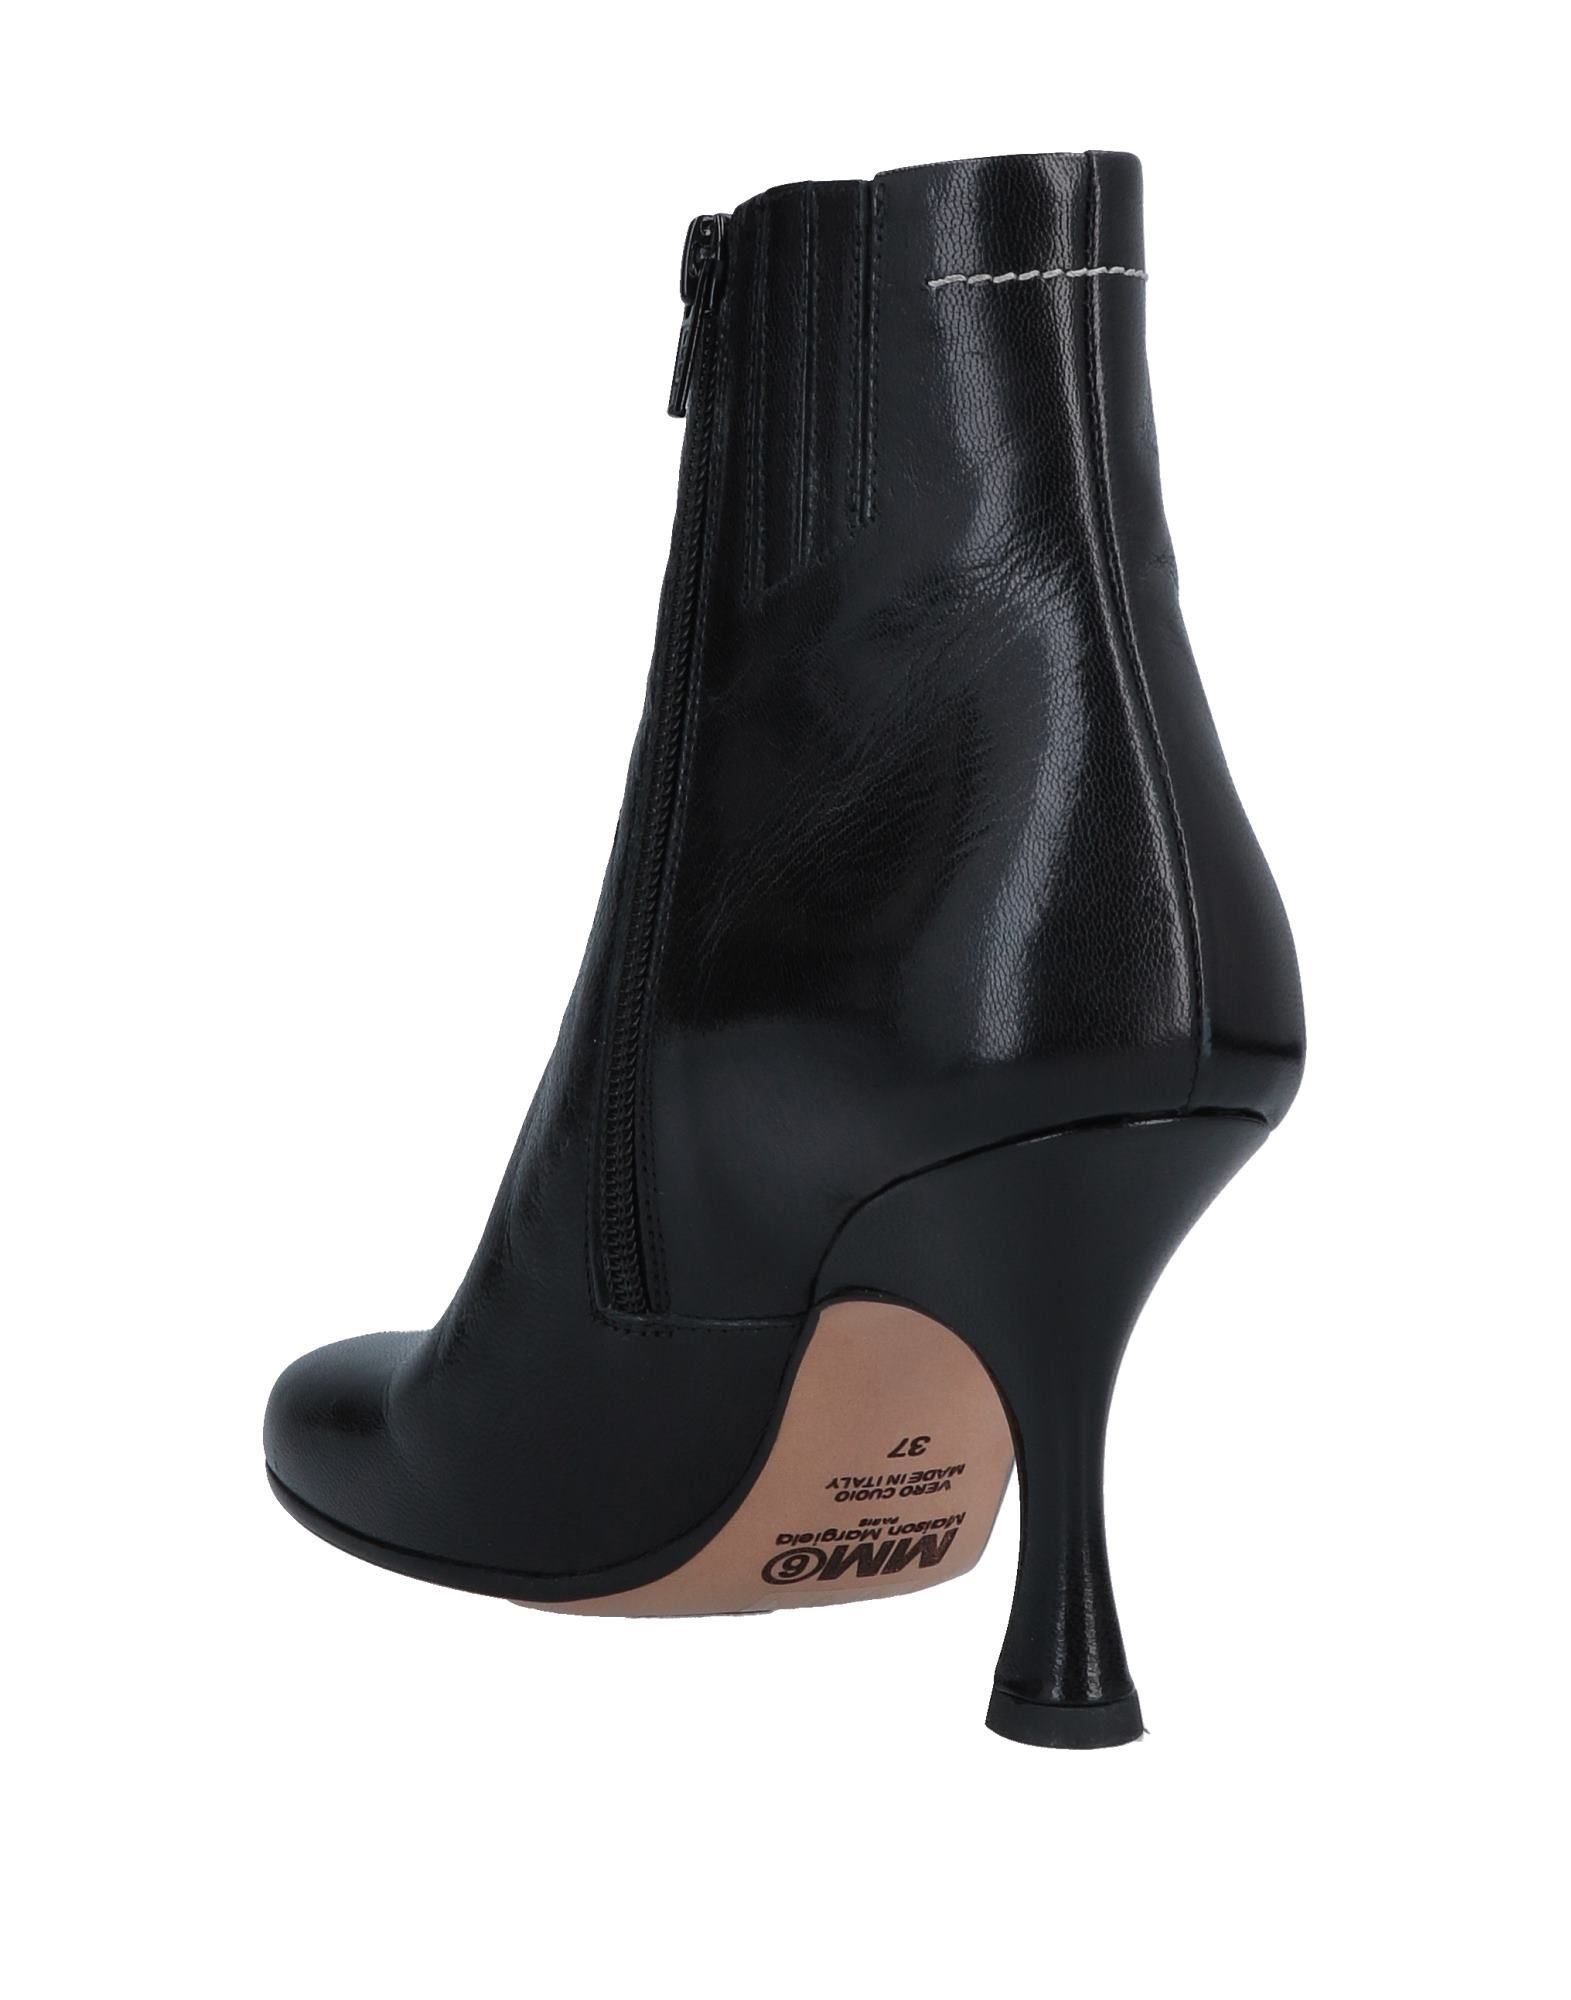 MM6 Maison Margiela Black Leather Ankle Boots